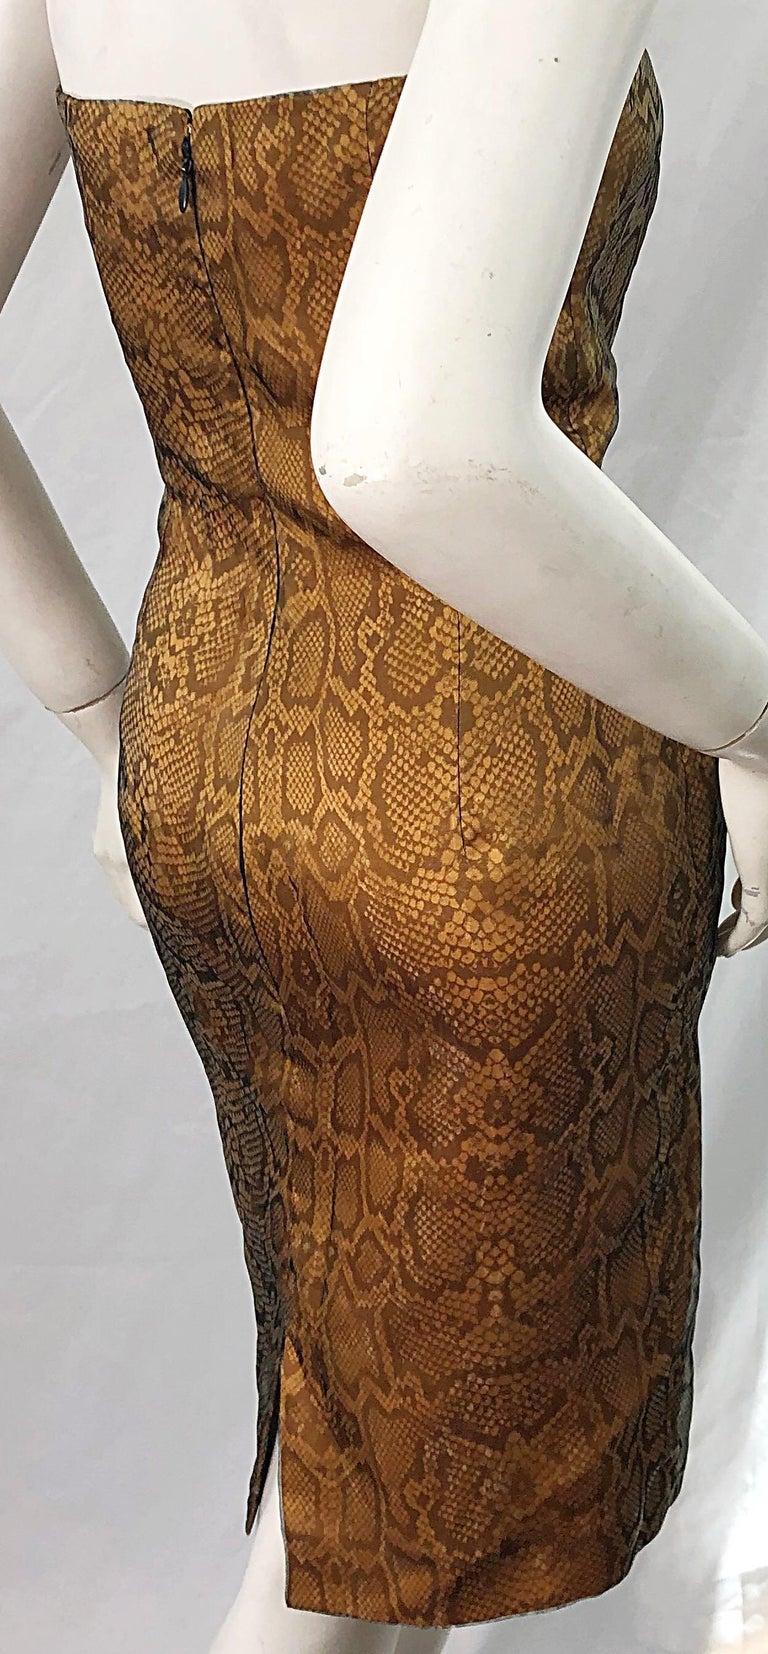 1990s Luca Luca Size 42 / 6 Snakeskin Silk Organza Strapless 90s Tan Brown Dress For Sale 4